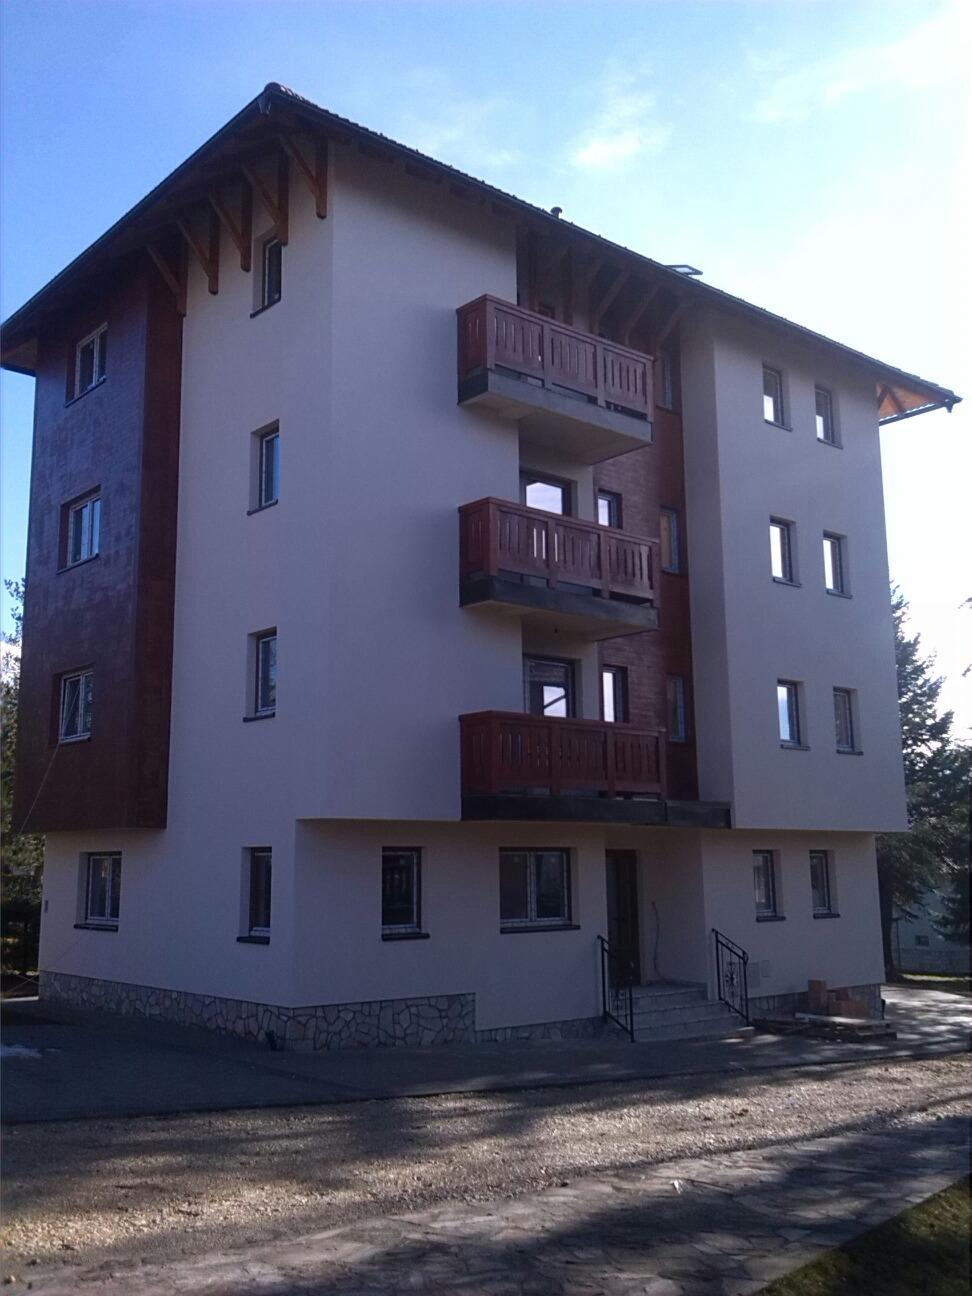 szanapredak-zlatibor3